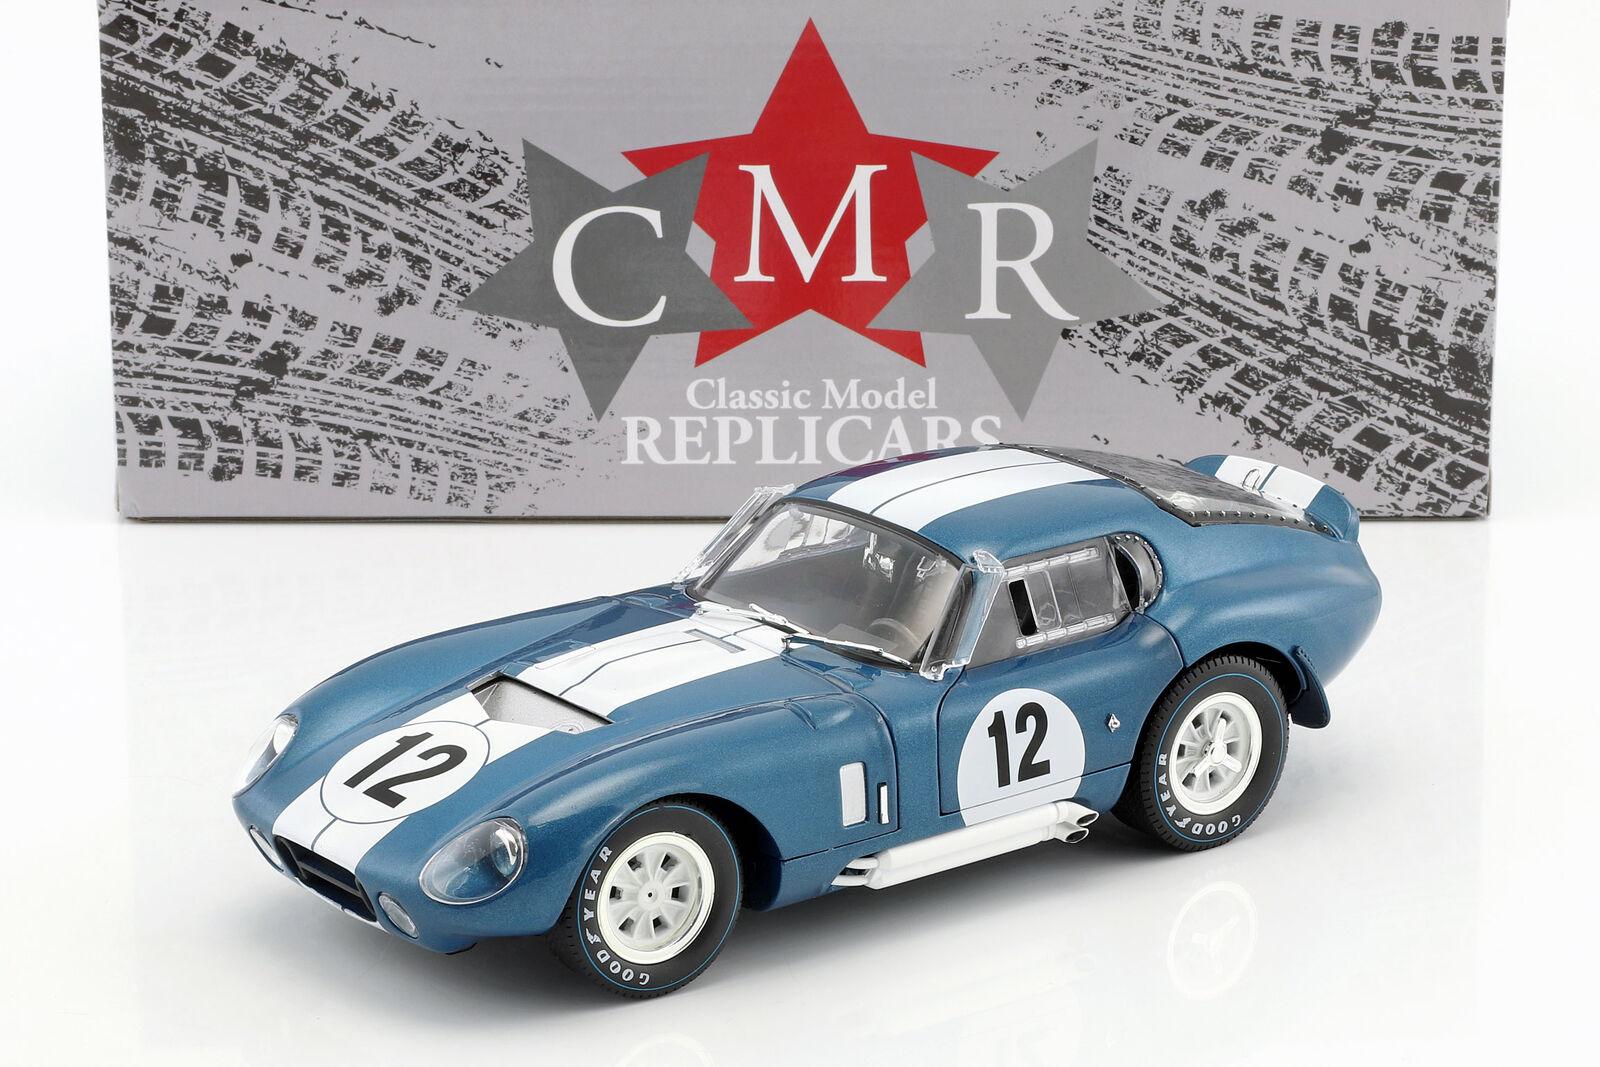 Shelby Cobra Daytona coupé  12 24h LeMans 1965 Schlesser, Grant 1:18 CMR